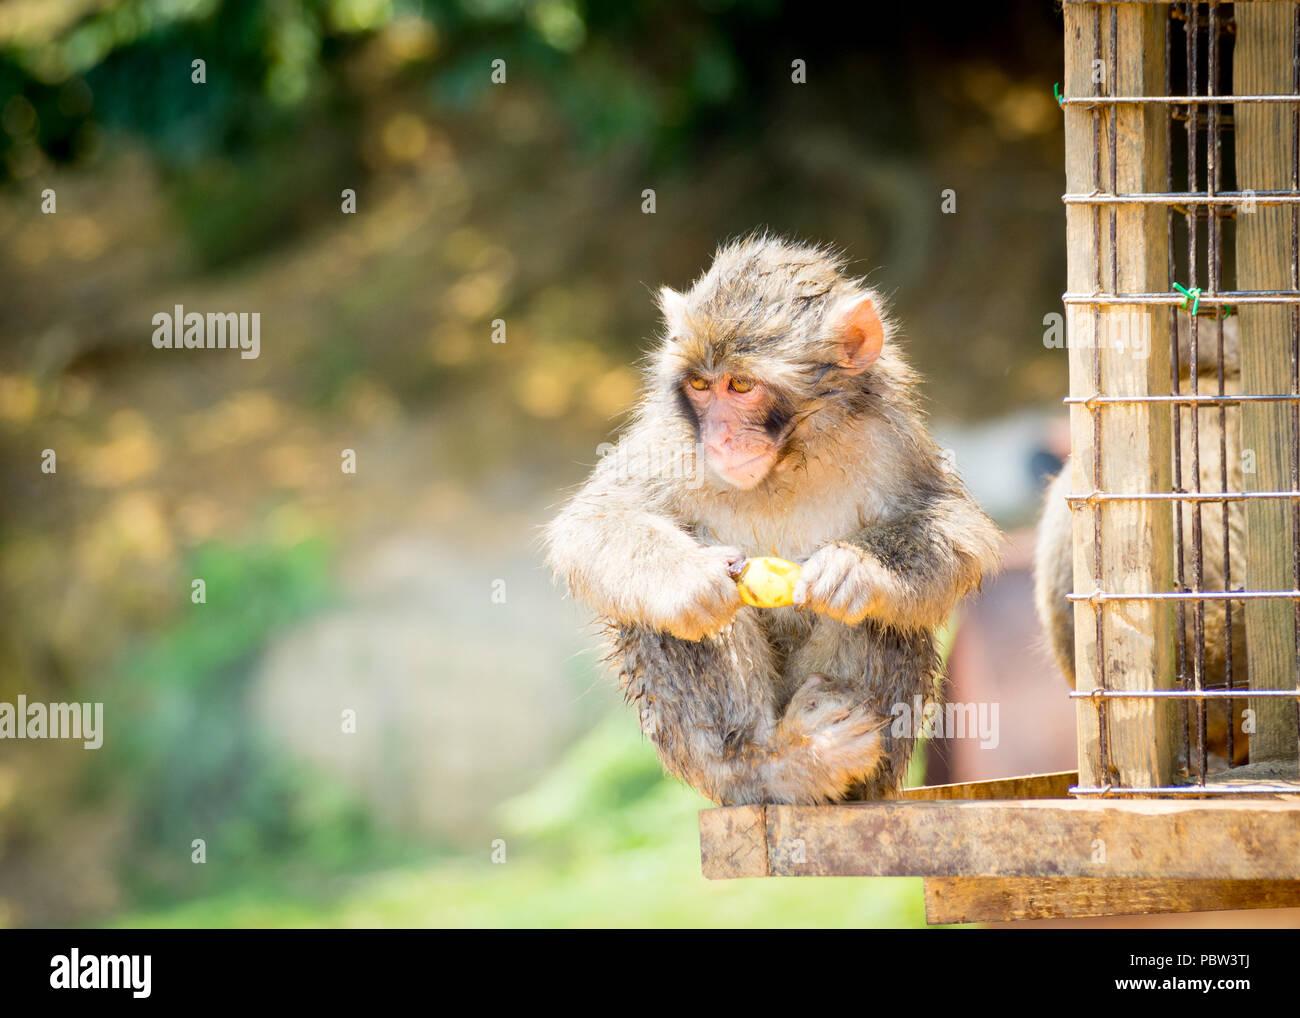 A juvenile Japanese macaque (Macaca fuscata), a.k.a. snow monkey, eats a banana at Iwatayama Monkey Park on Mount Arashiyama, Arashiyama, Kyoto, Japan Stock Photo